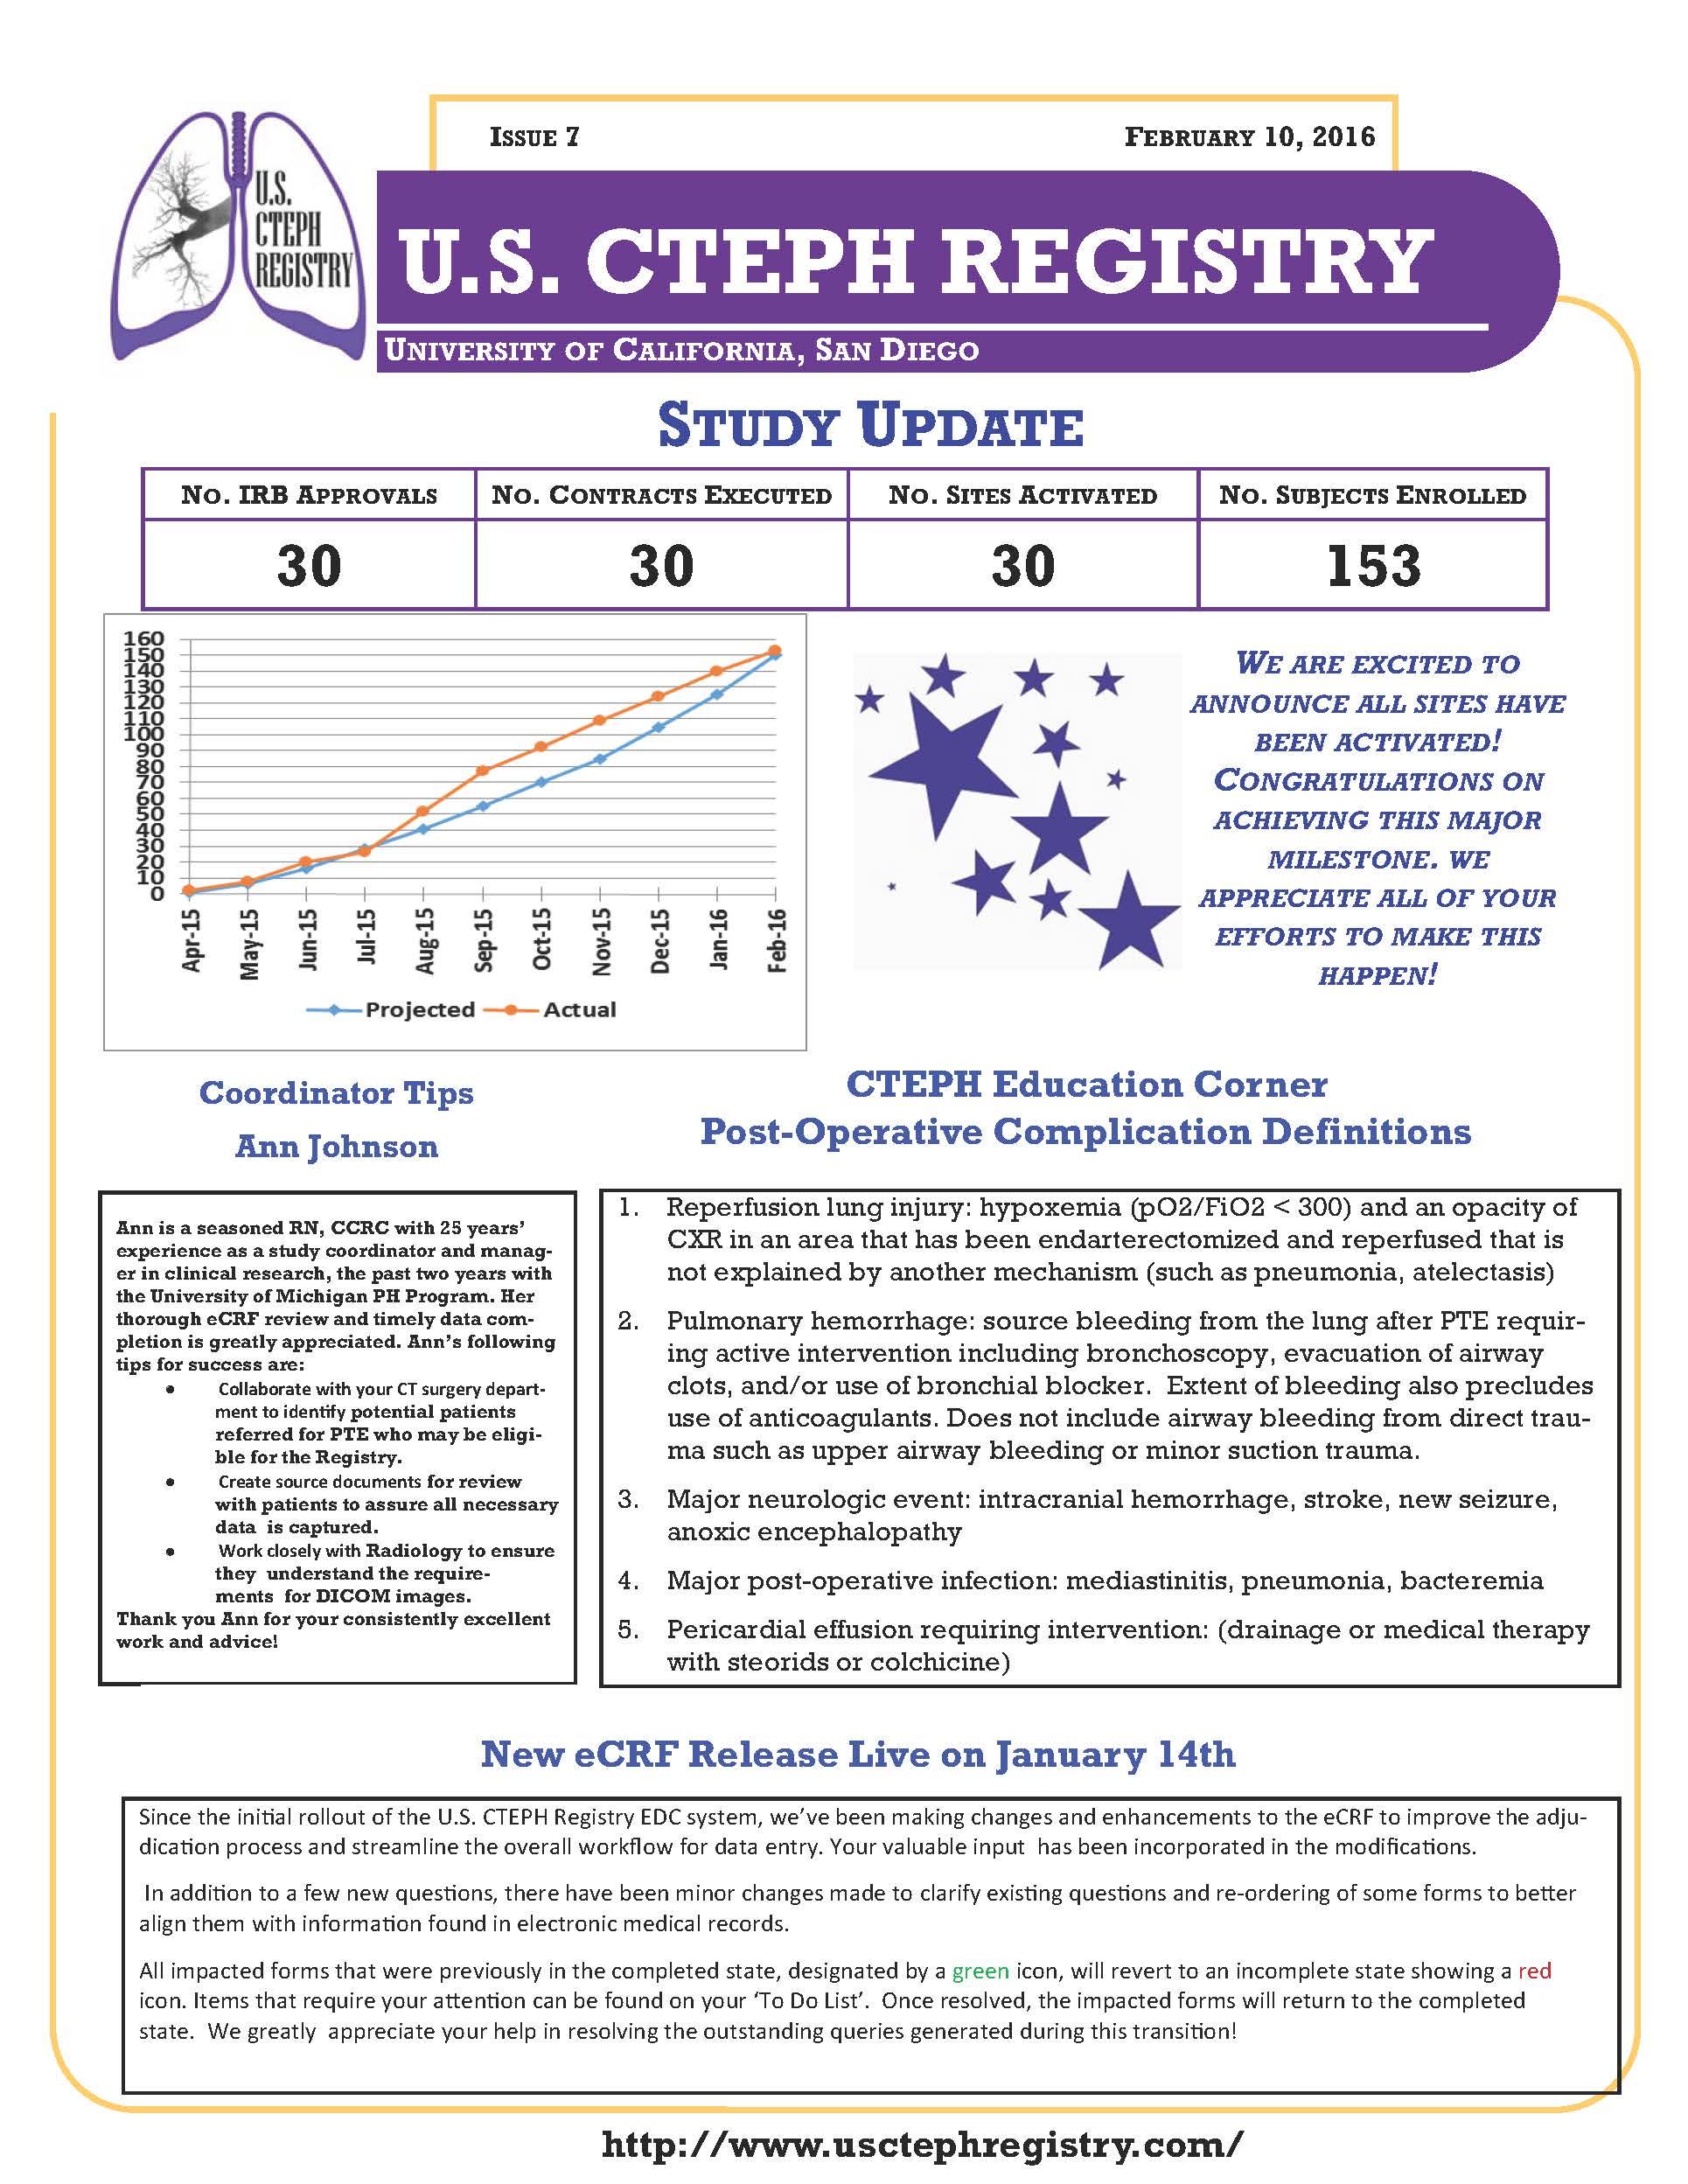 CTEPH Newsletter 2.10.2016_Page_1.jpg